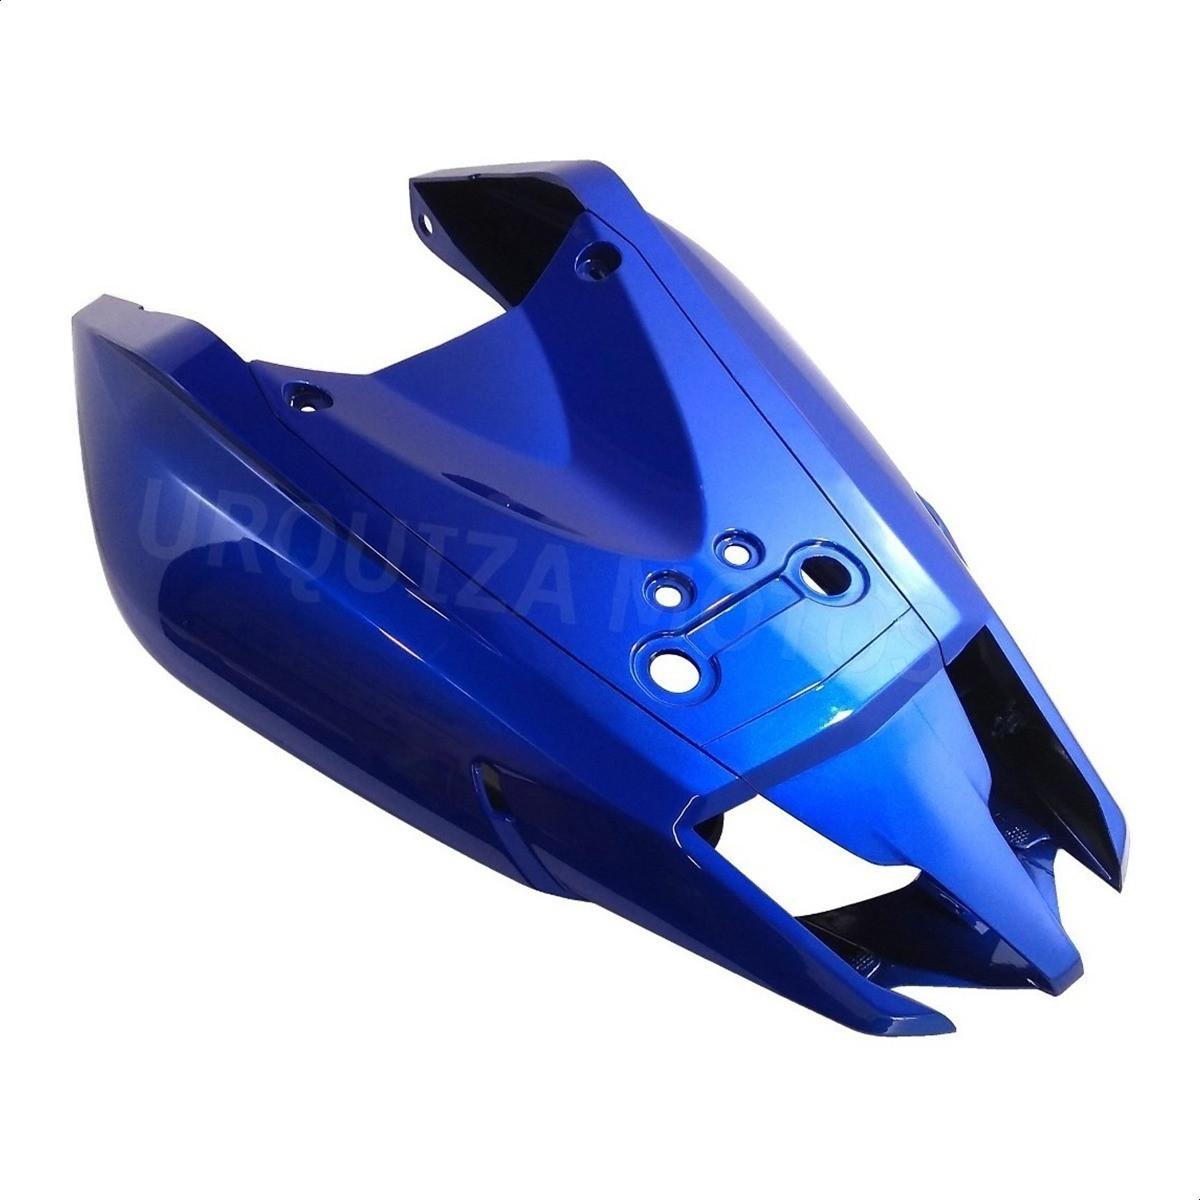 Cacha Colin Trasero Azul Bajaj Rouser Ns 200 Original